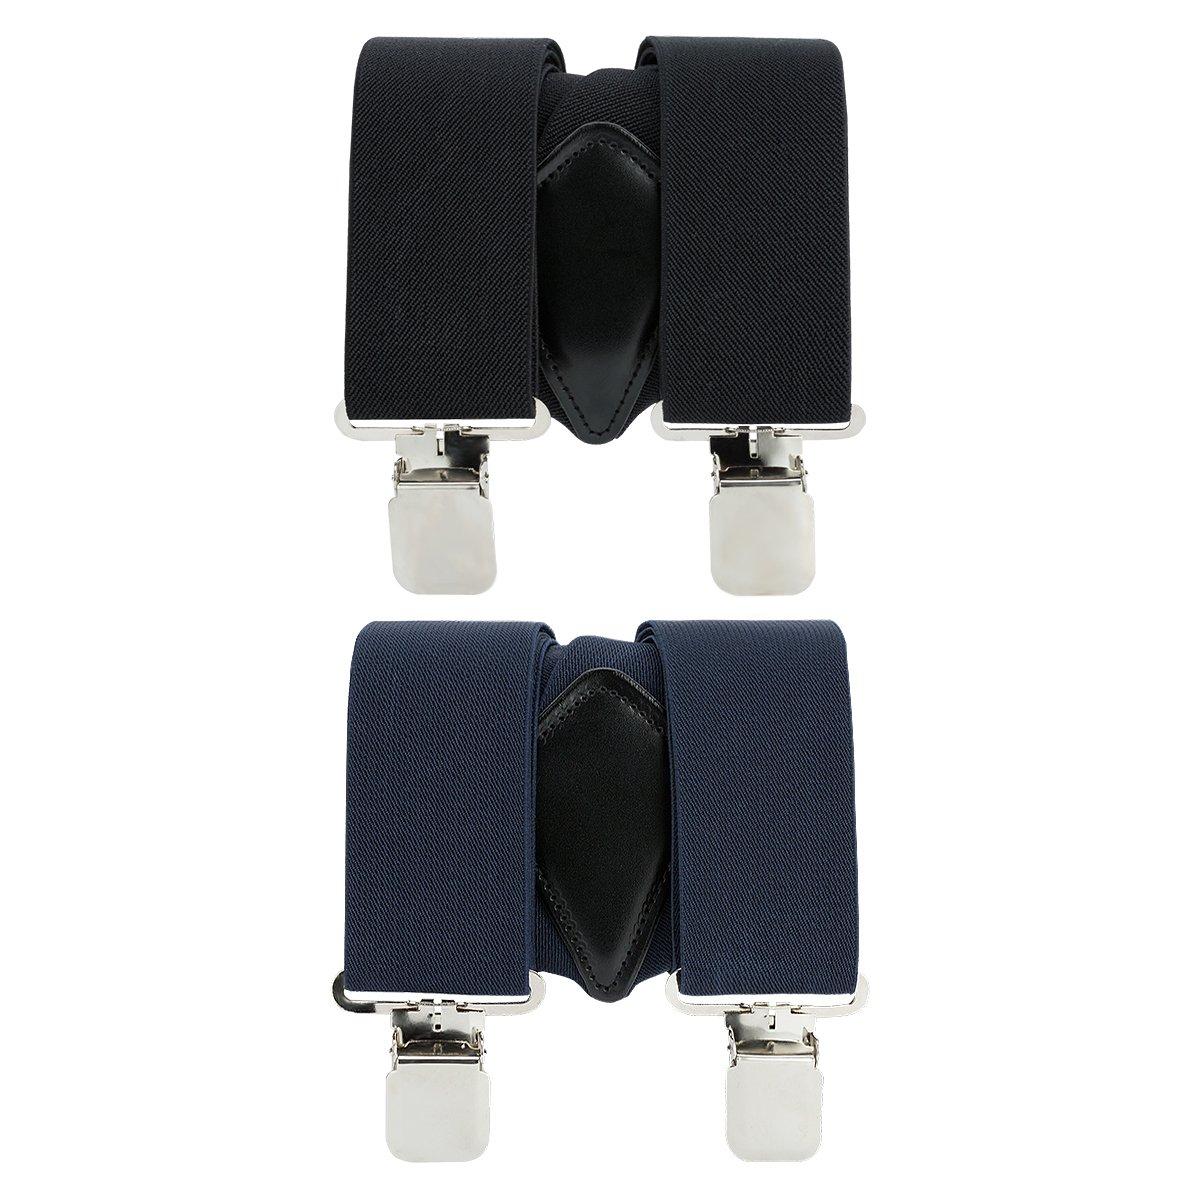 Mens X-Back Heavy Duty Work Suspenders 2pc Adjustable Elastic Clip Suspenders (Black/Navy Blue) One Size by GradeCode (Image #5)